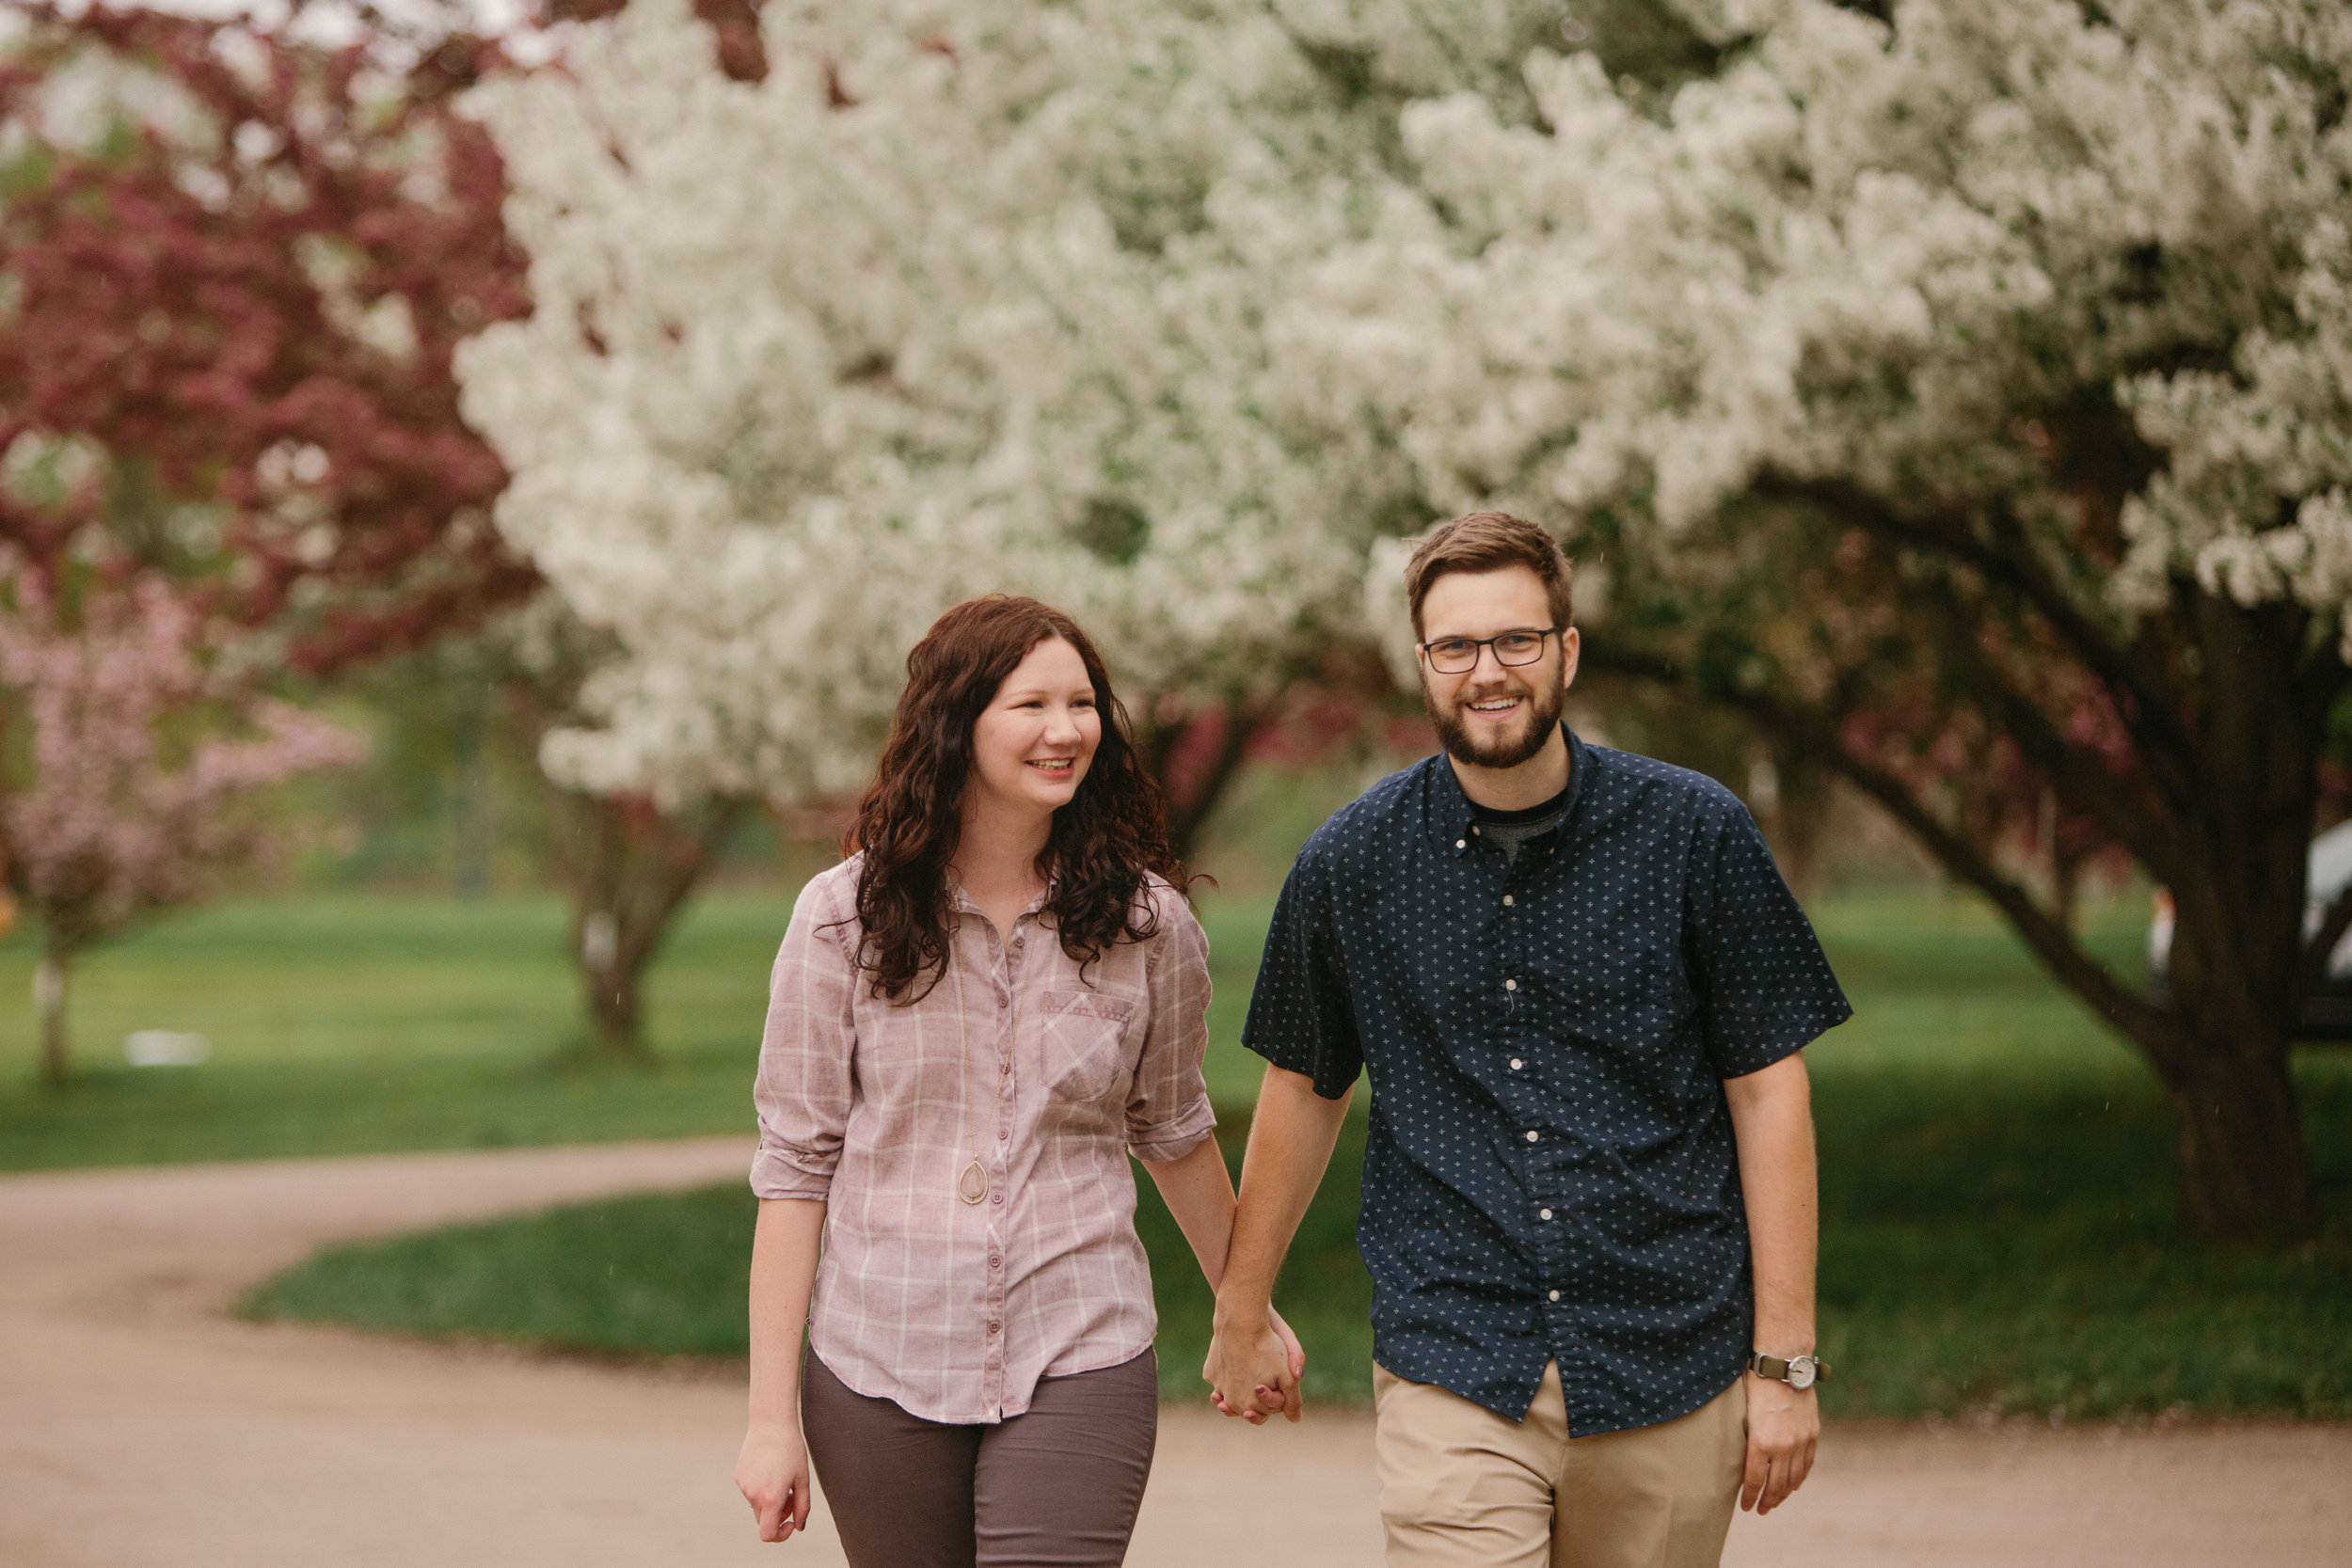 couple walking and smiling engagement photos iowa des moines cedar falls